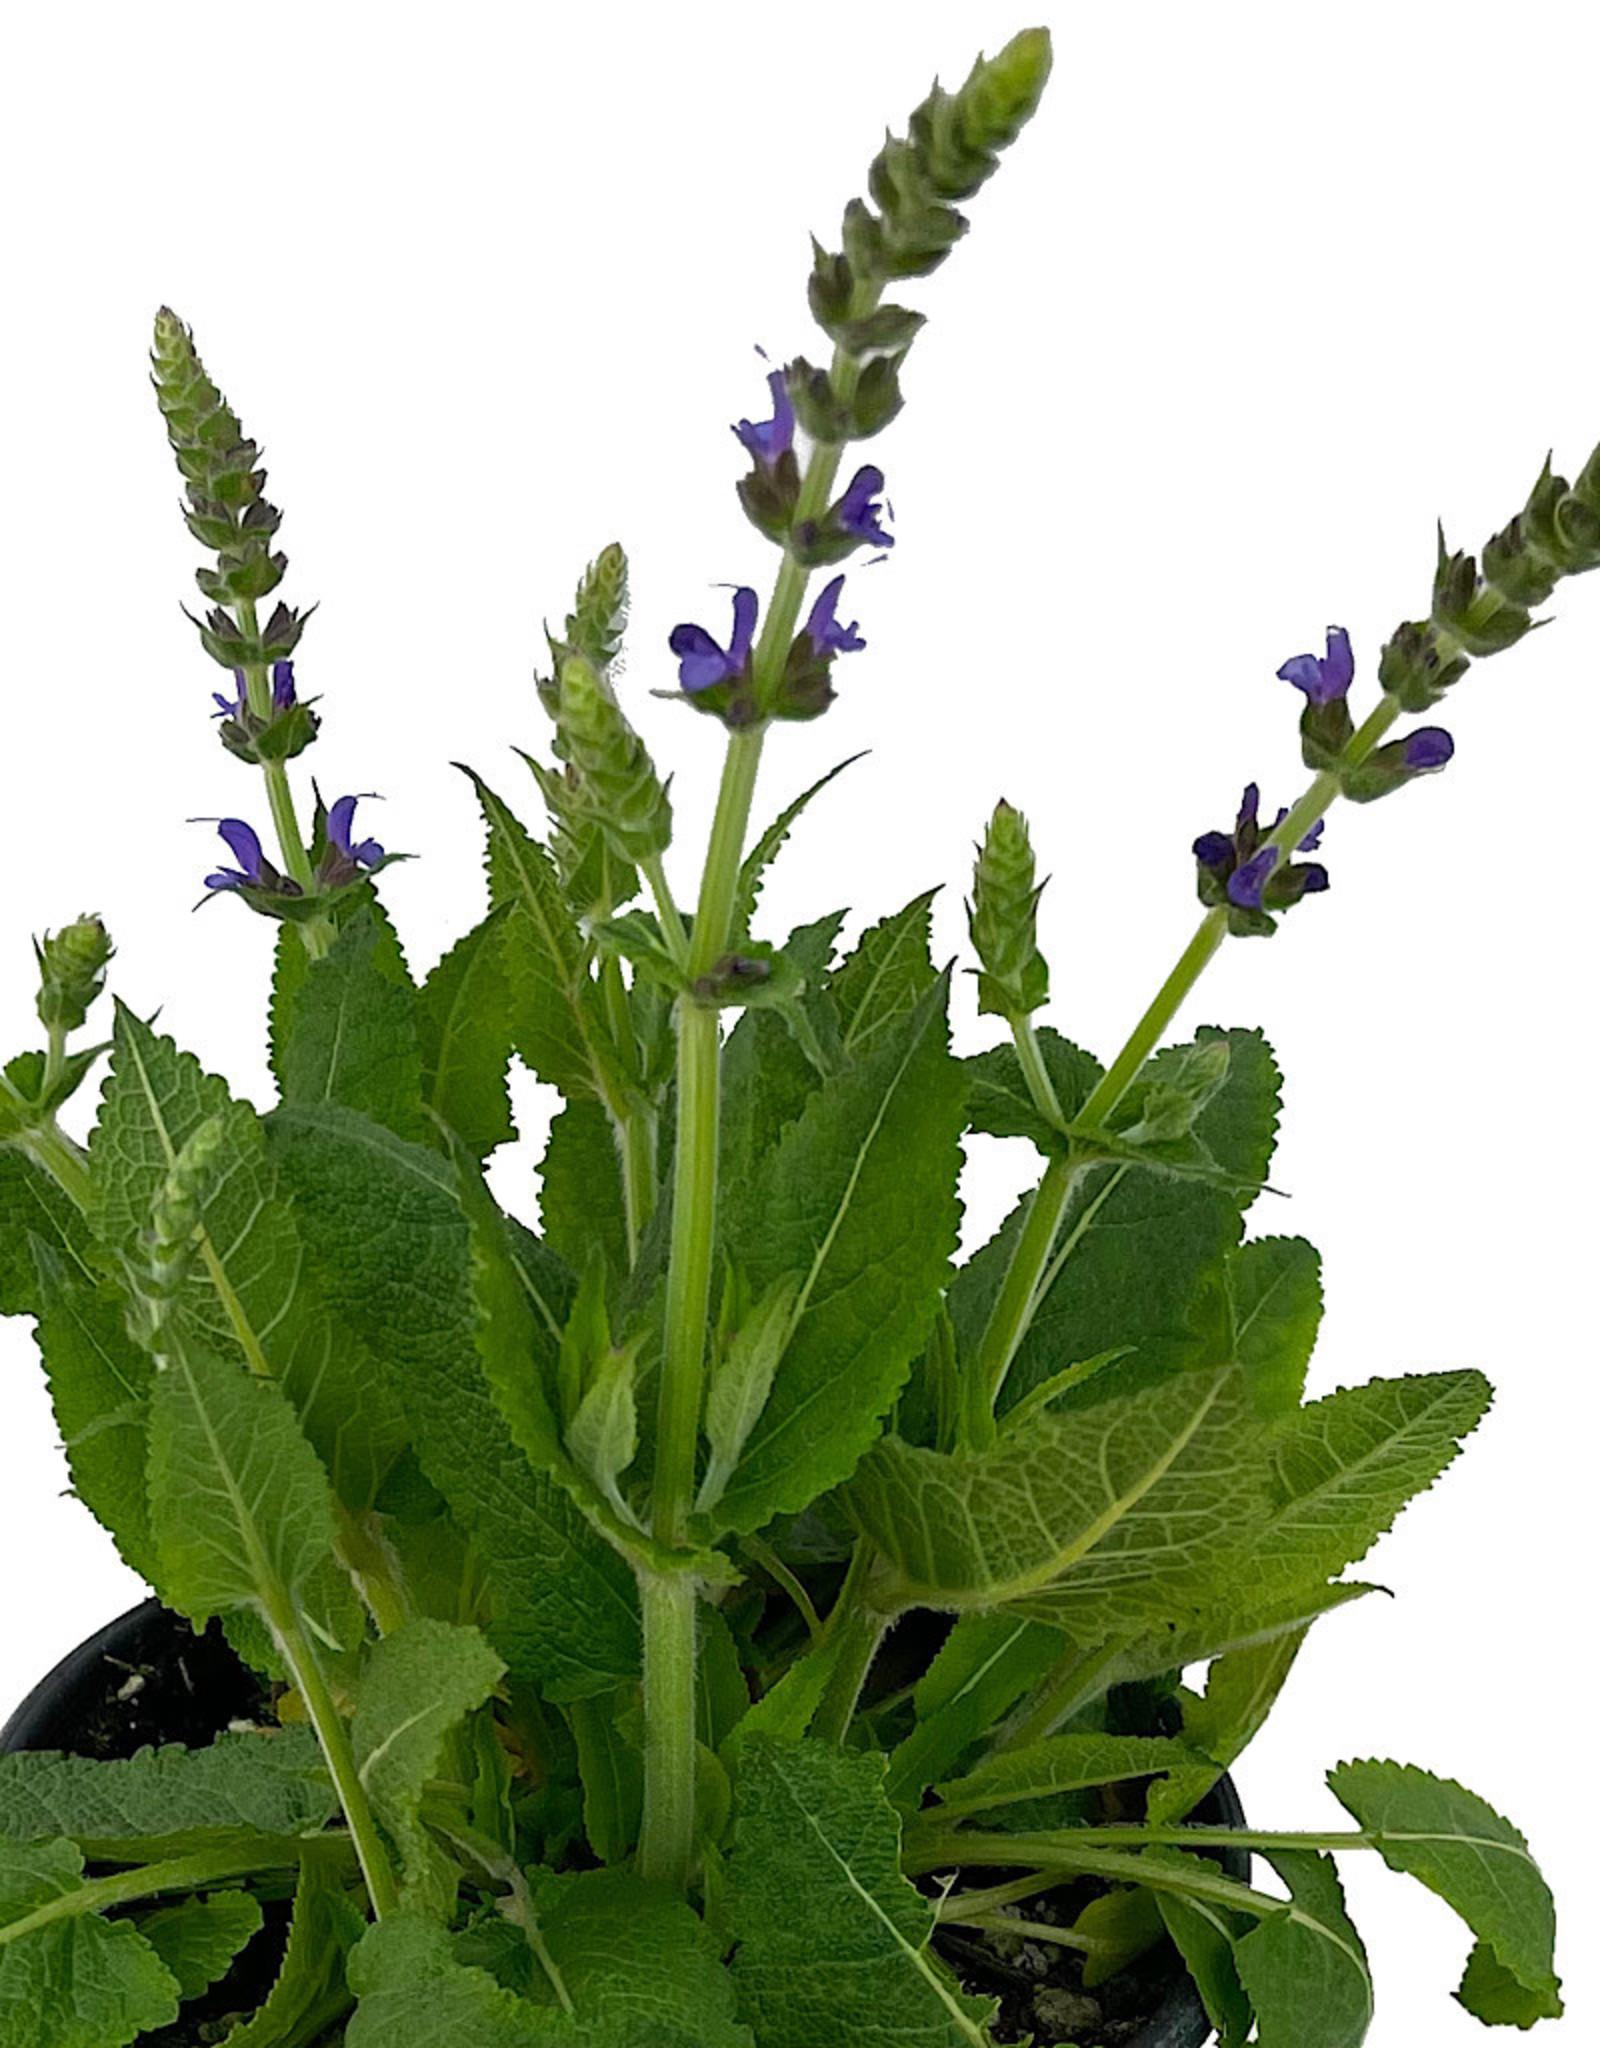 Salvia nemorosa 'May Night' 1 Gallon